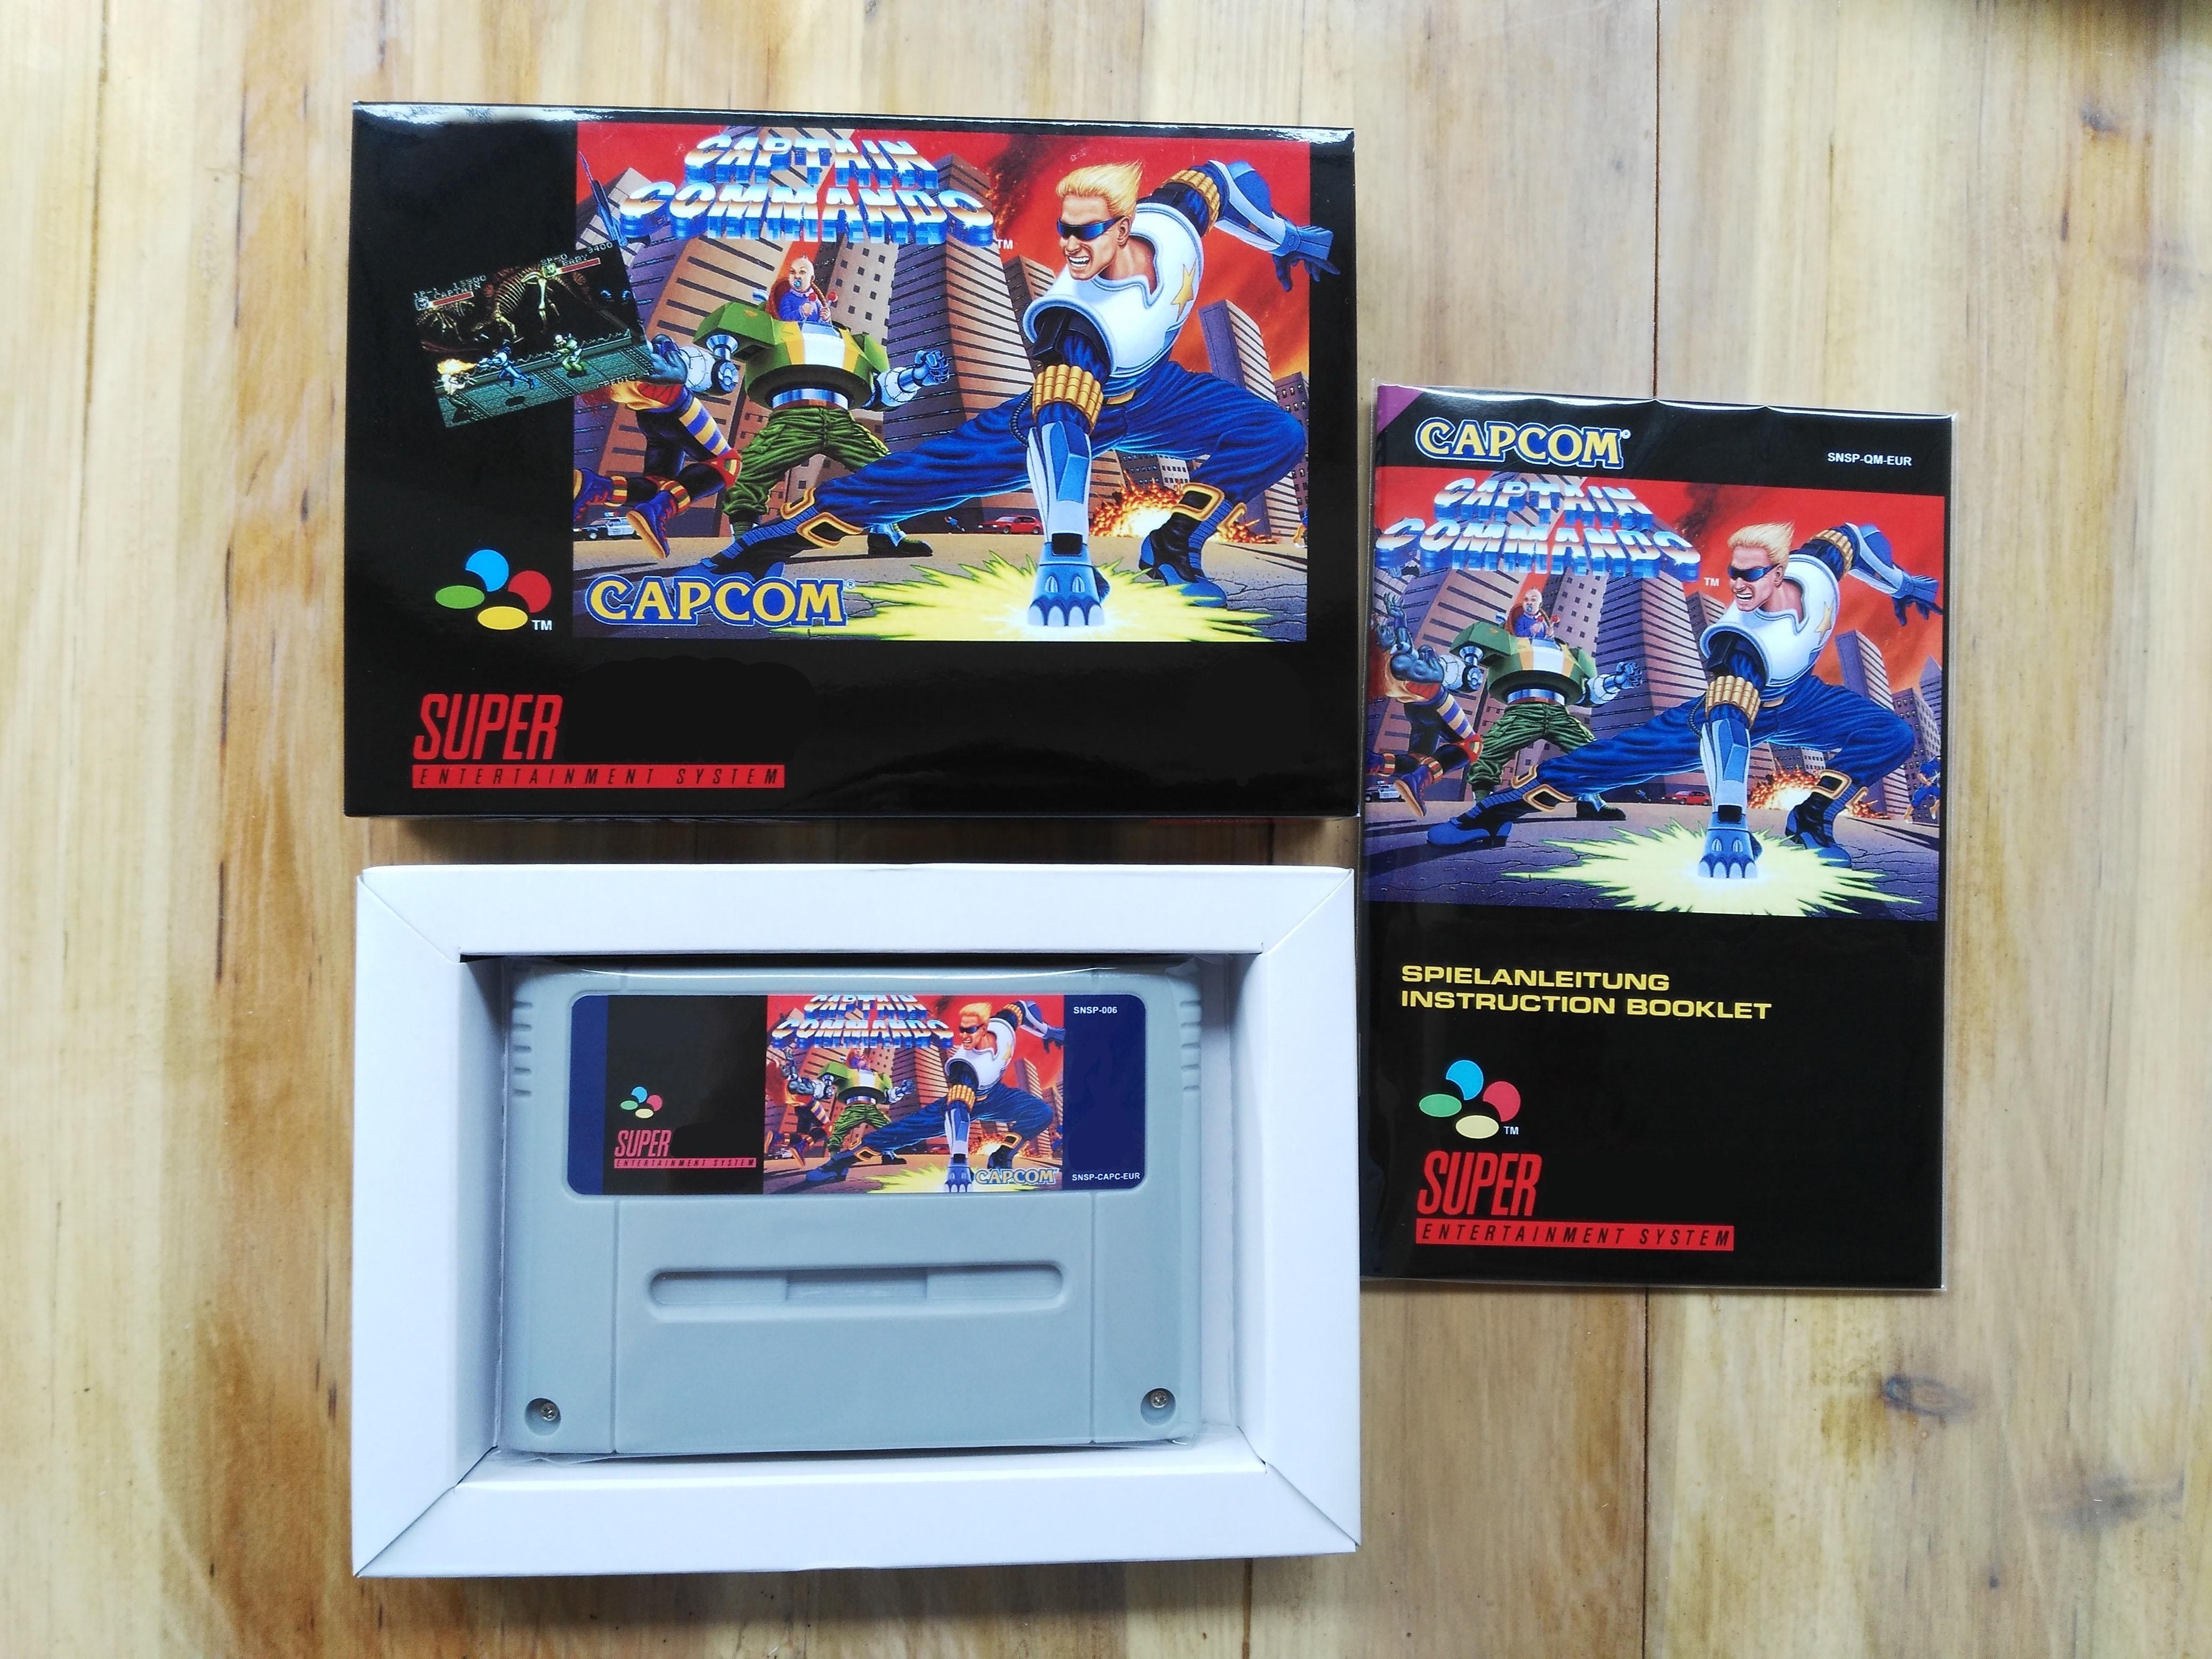 16Bit Games CAPTAIN COMMANDO EUR PAL Version Box Manual Cartridge